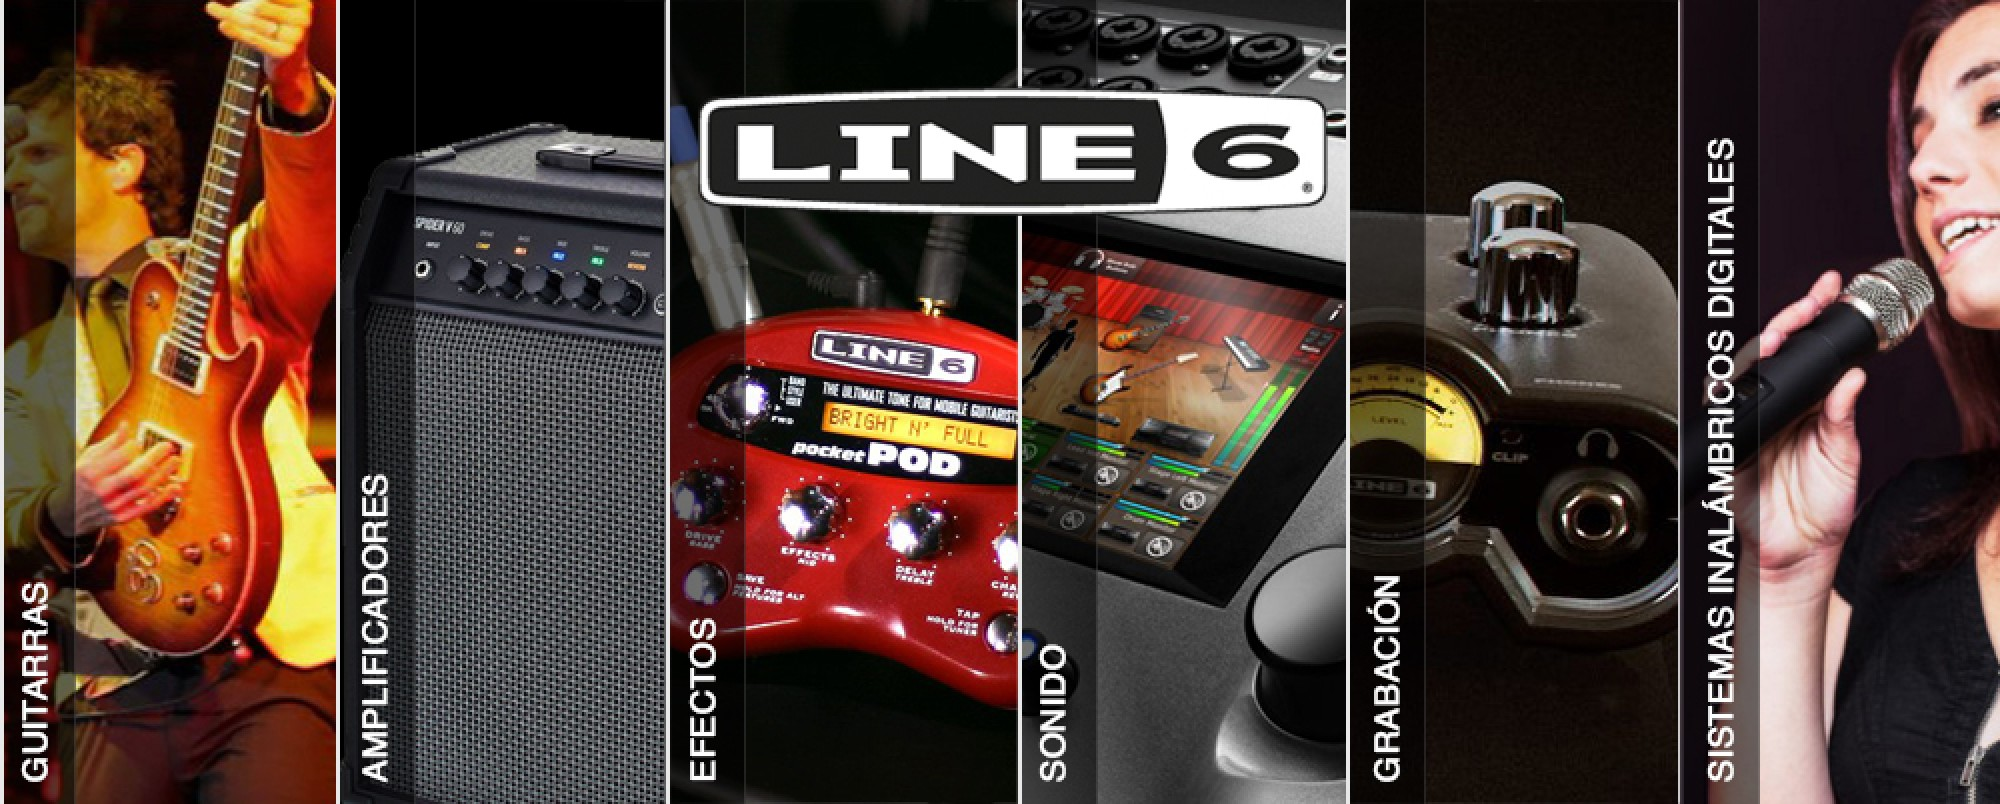 507-Line-6-Nuestra-Historia.--kllfu.jpg